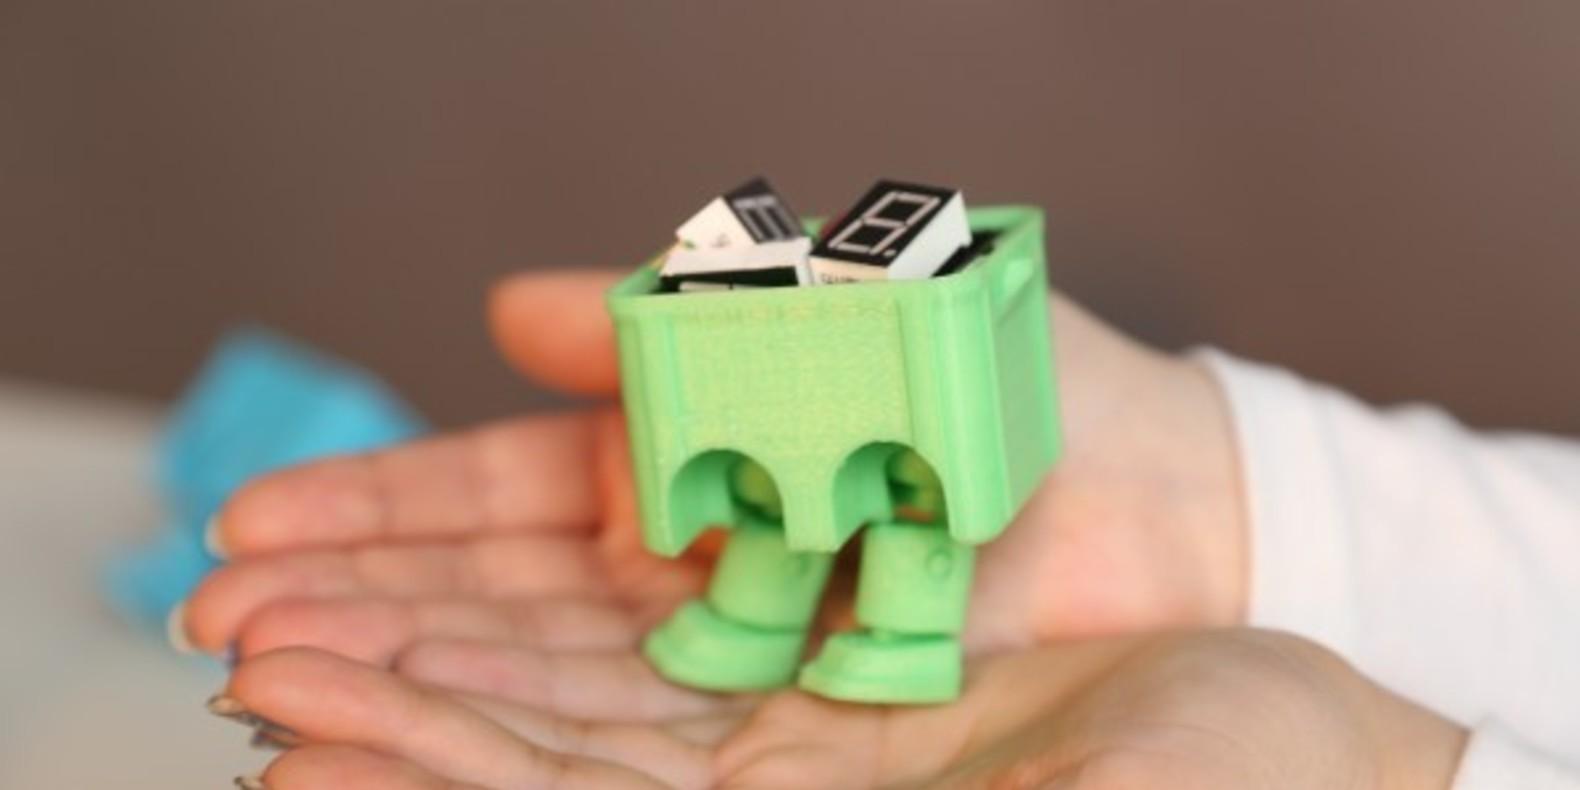 Step box step boite a outils tool box 3D printed 3D printing imprimée en 3D impression 3D Cults 5